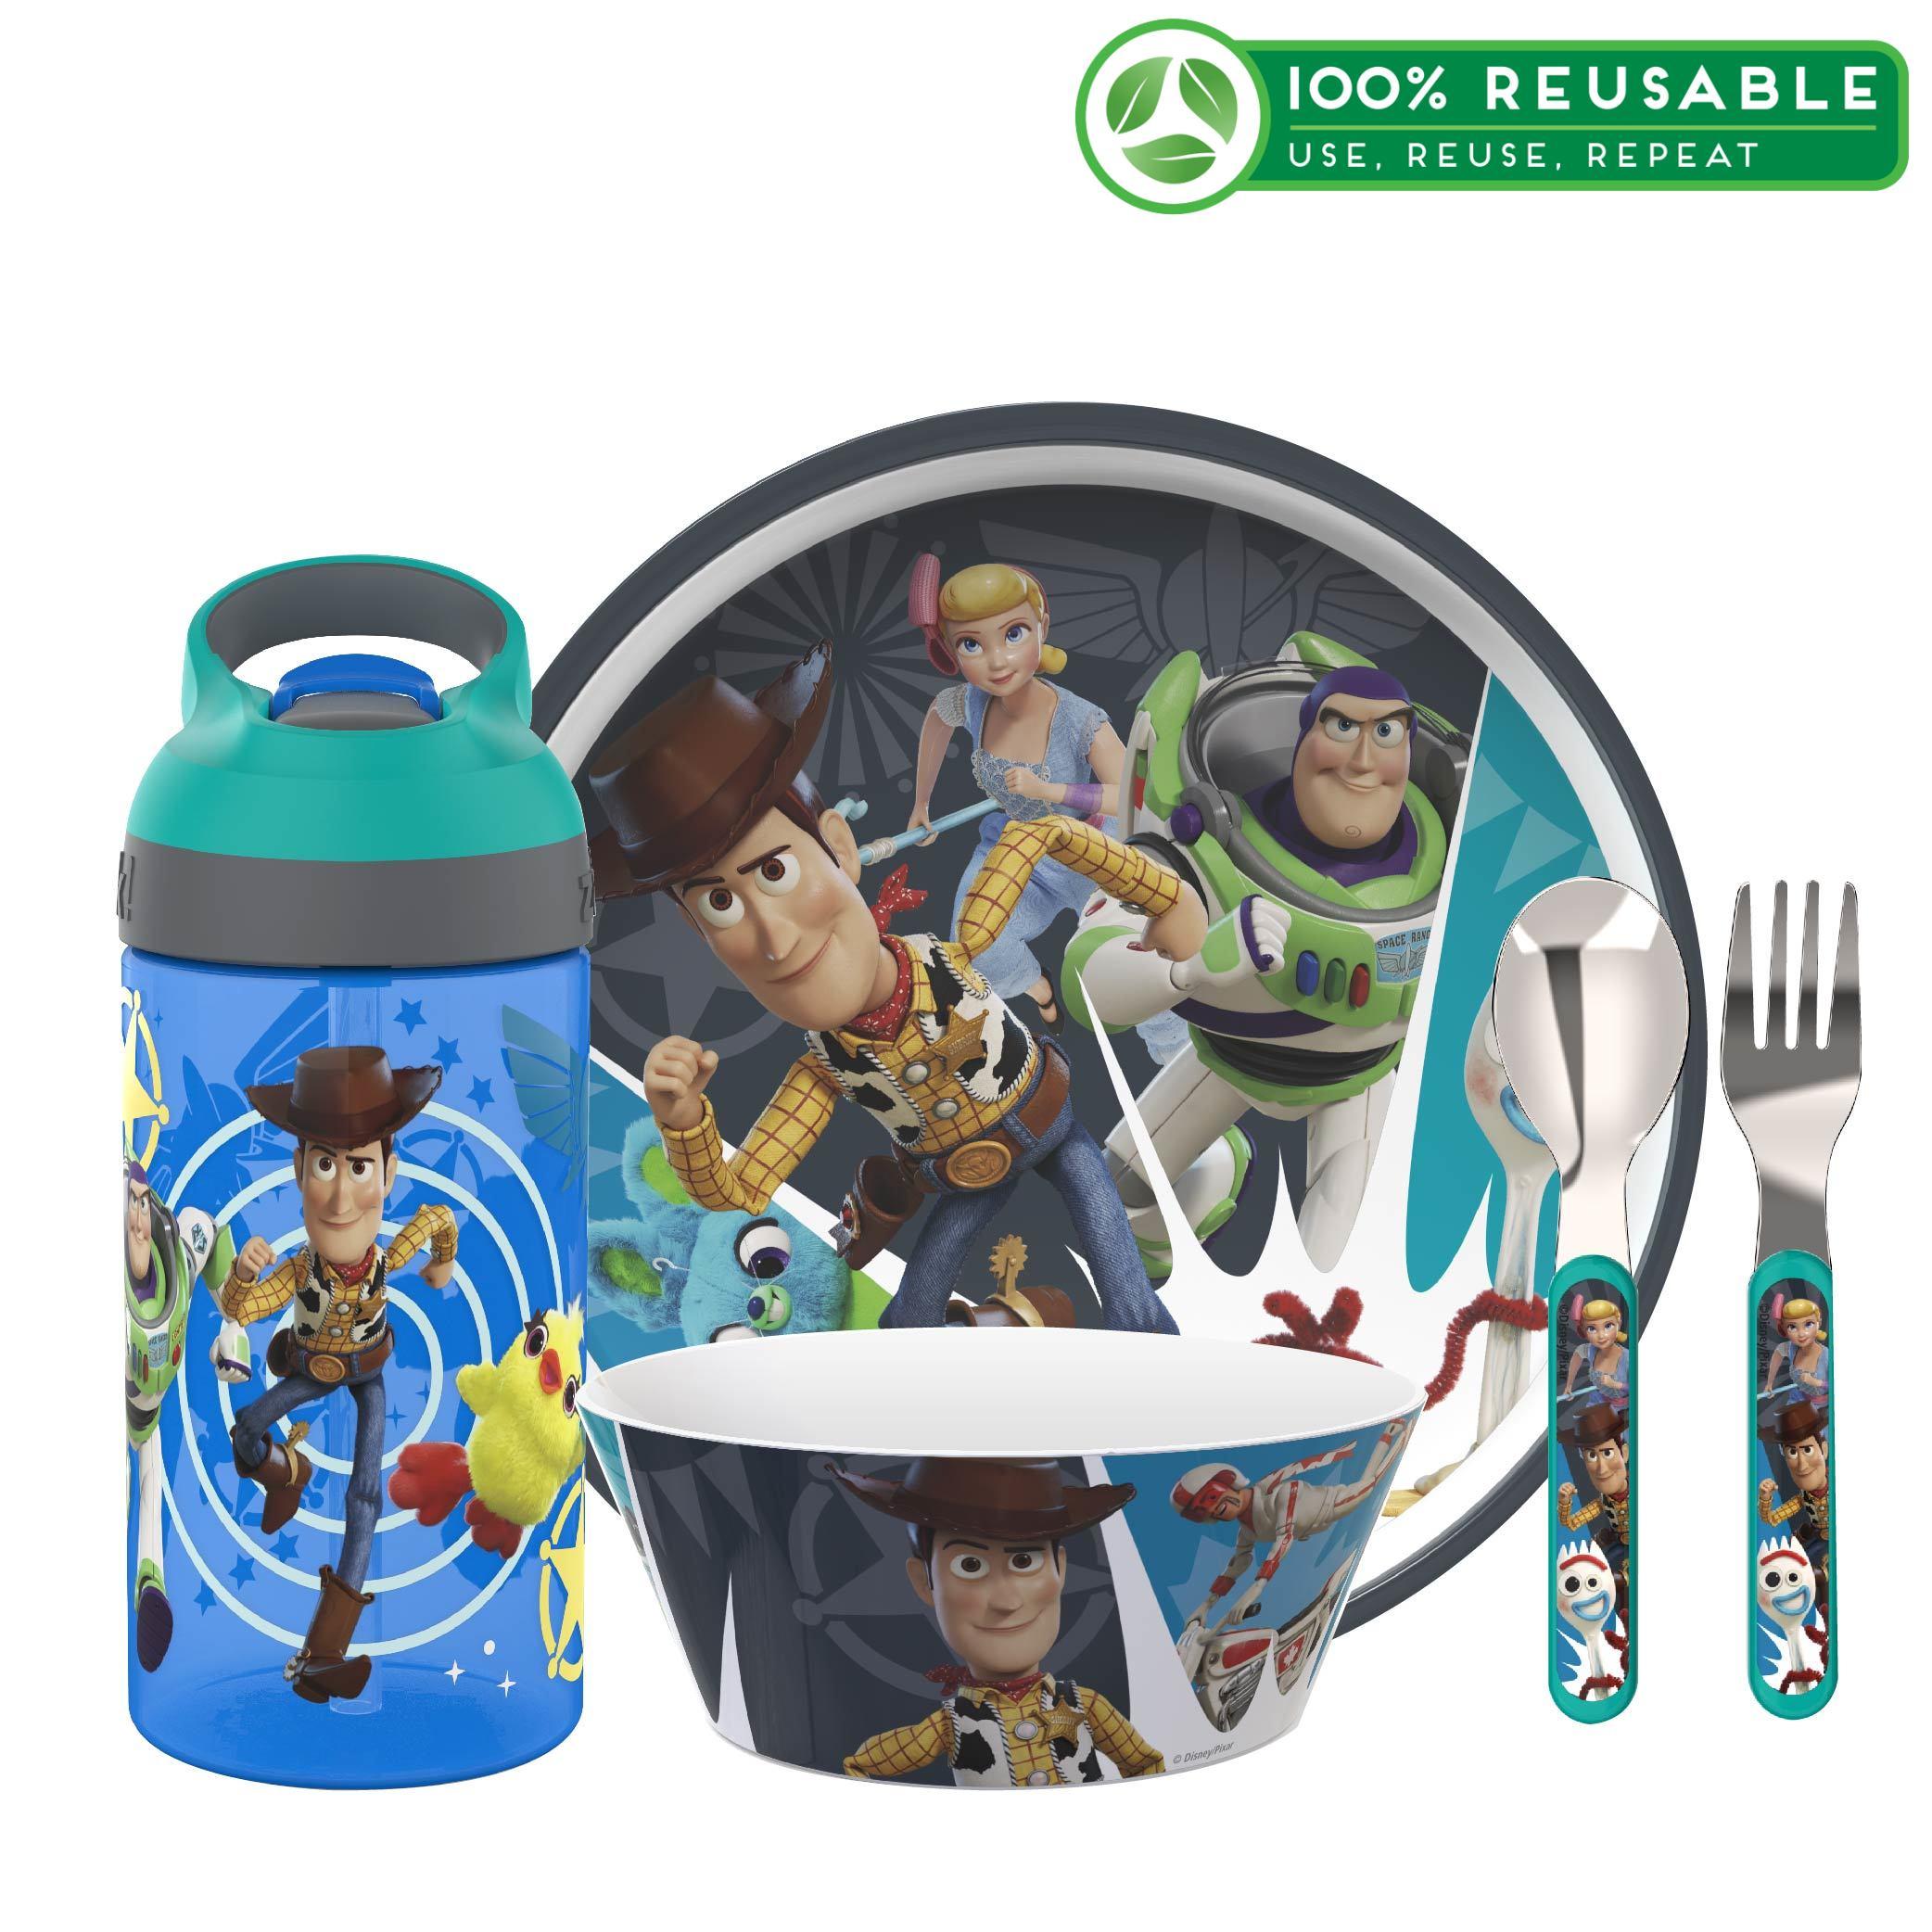 Disney Pixar Dinnerware Set, Toy Story 4, 5-piece set slideshow image 1